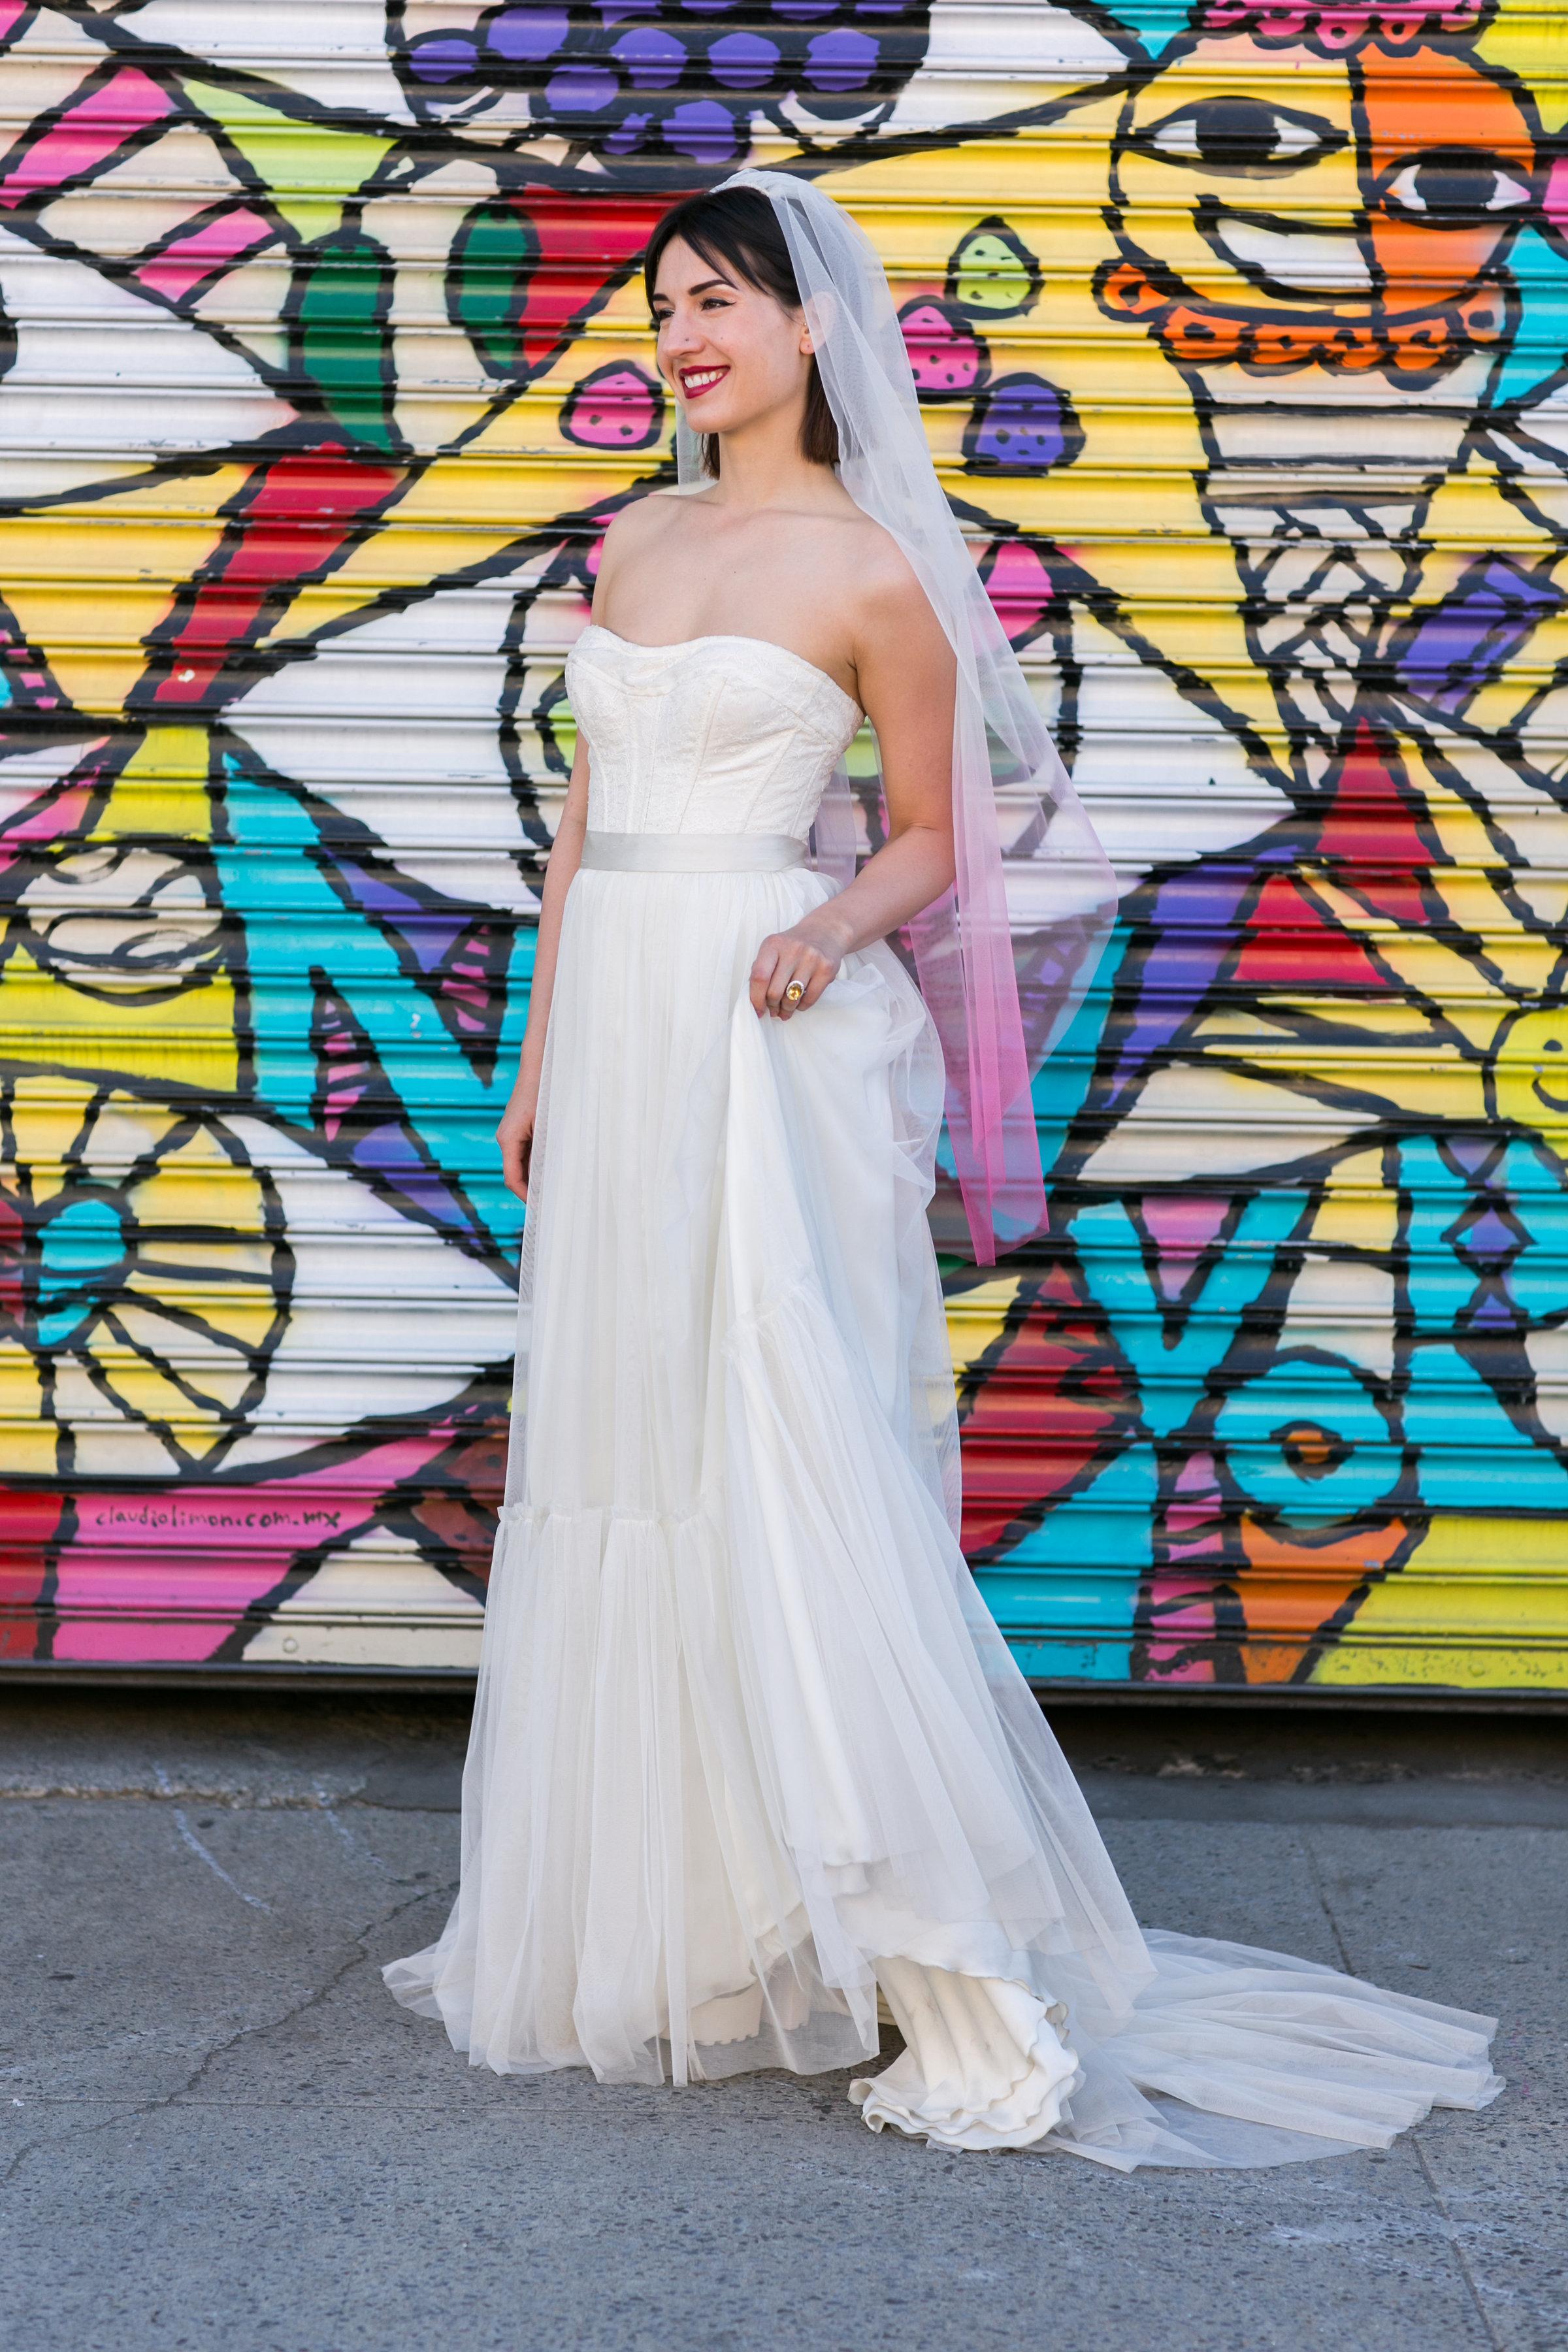 027_NYC-wedding-photographer-Amber-Marlow.jpg